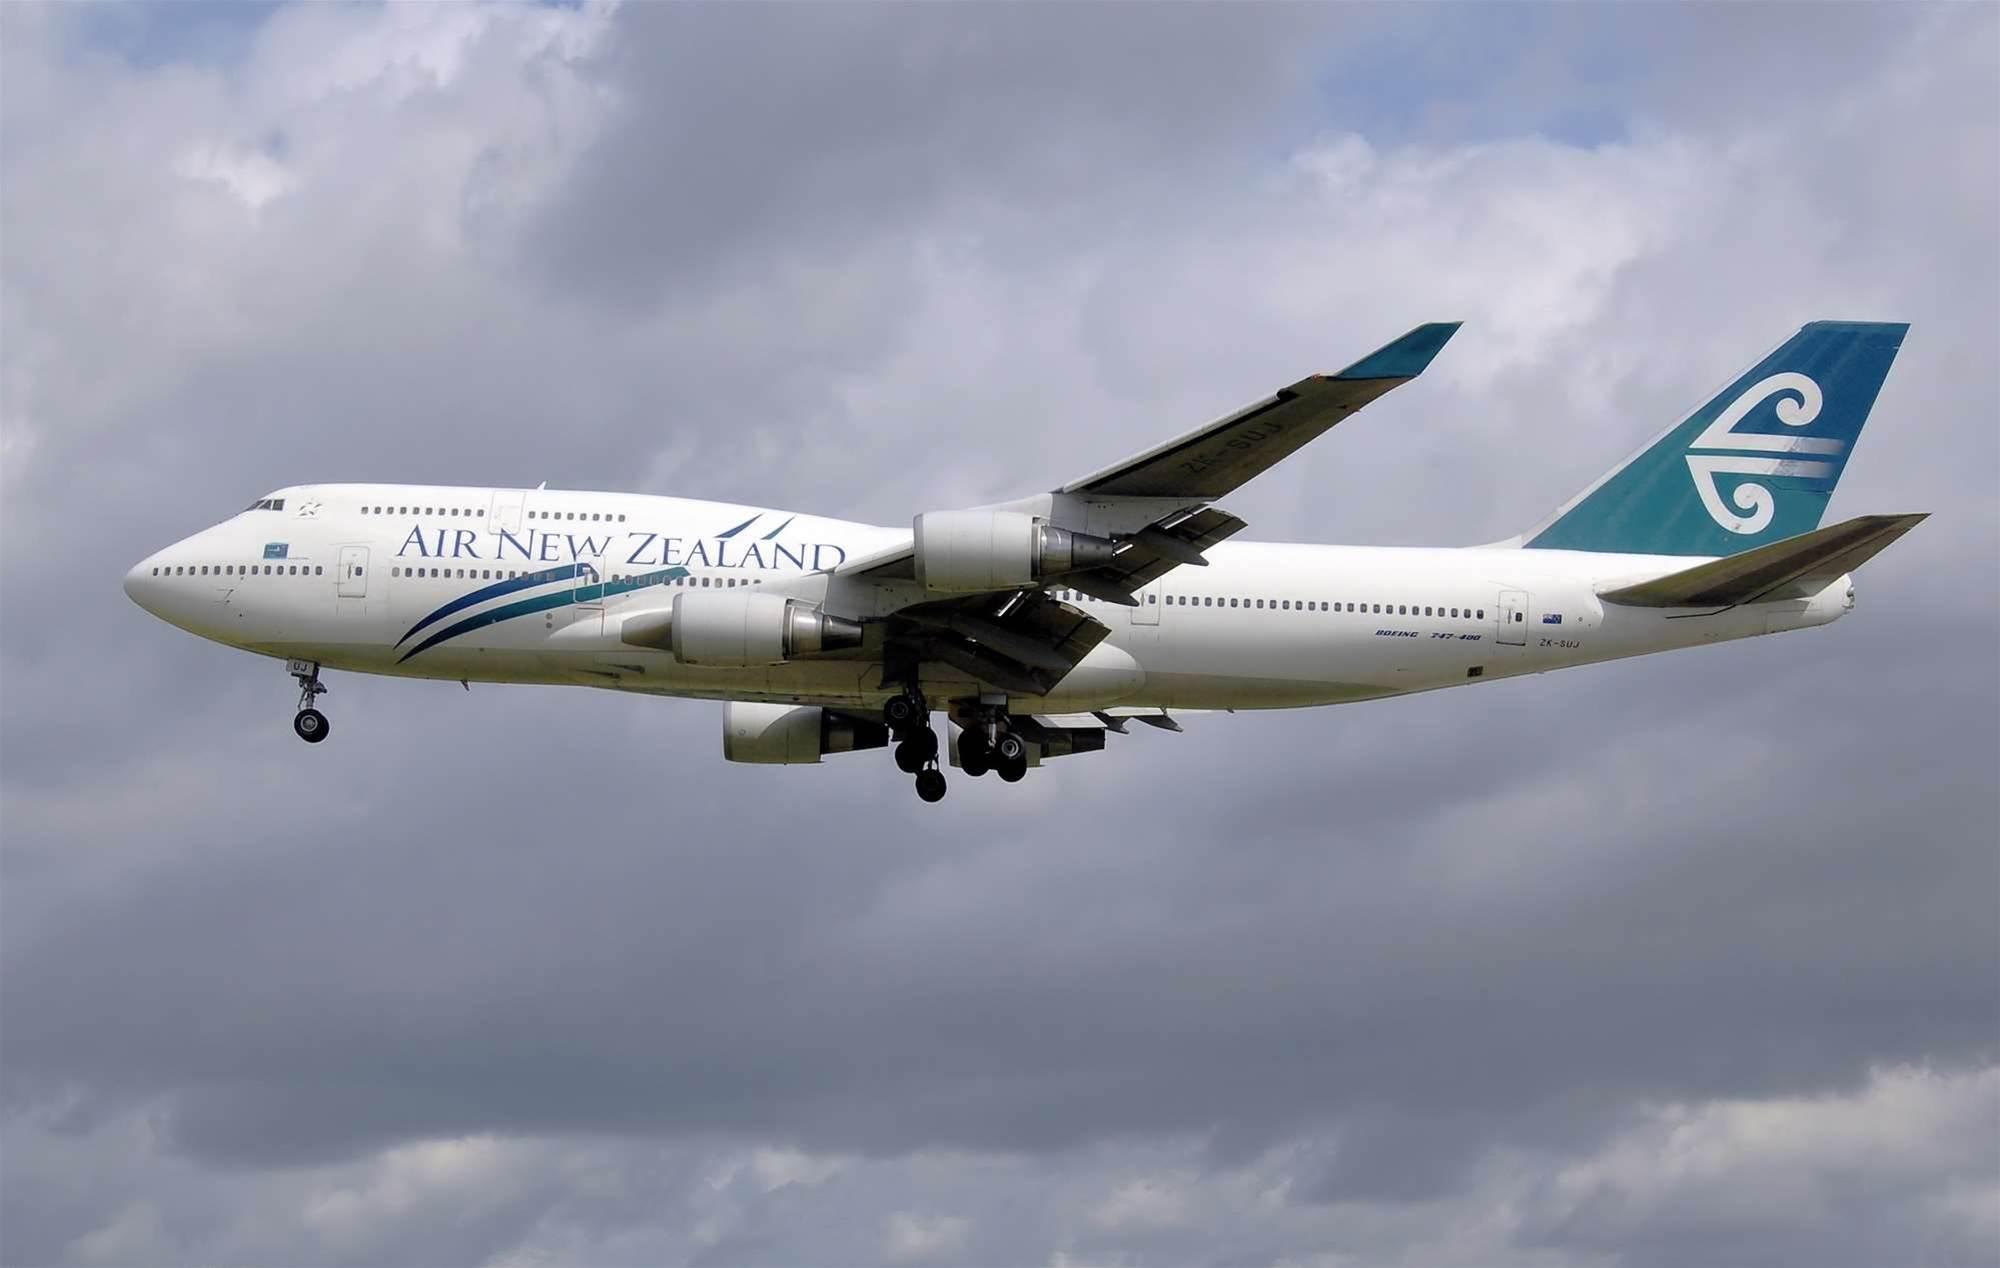 How a cultural overhaul helped drive Air NZ's digital transformation